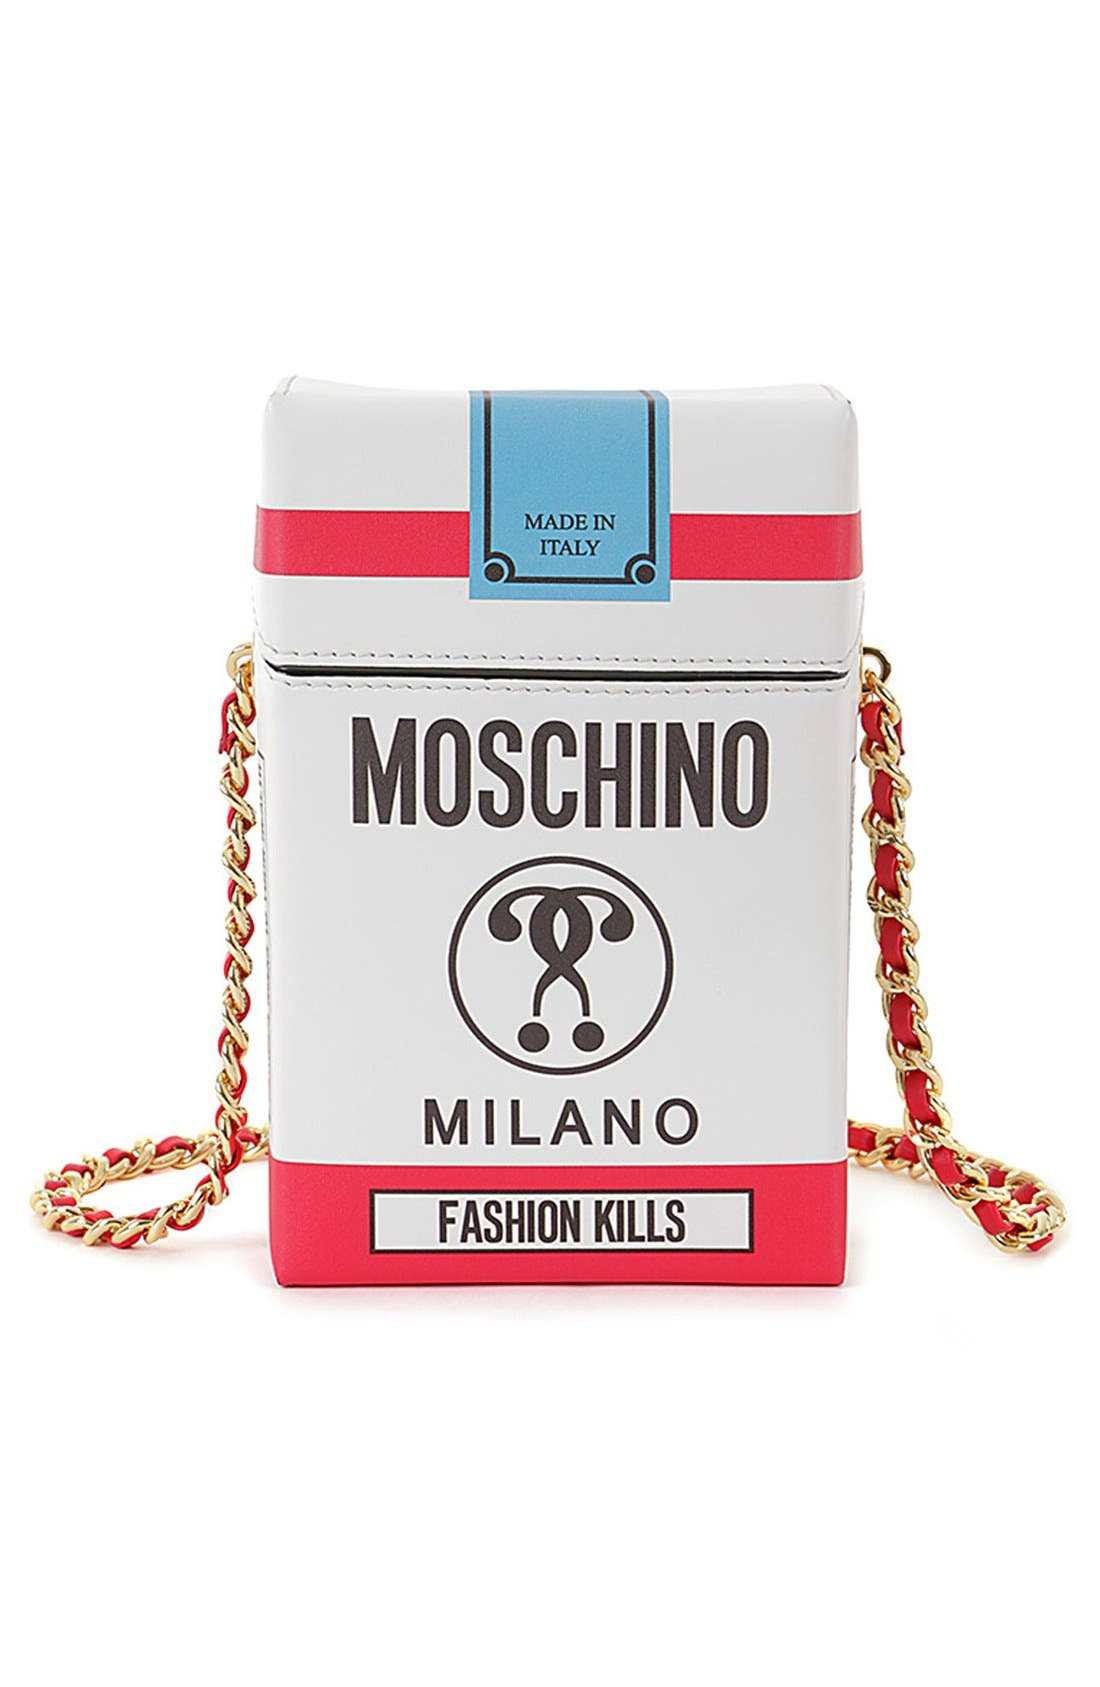 Alternate Image 1 Selected - Moschino 'Fashion Kills' Crossbody Bag